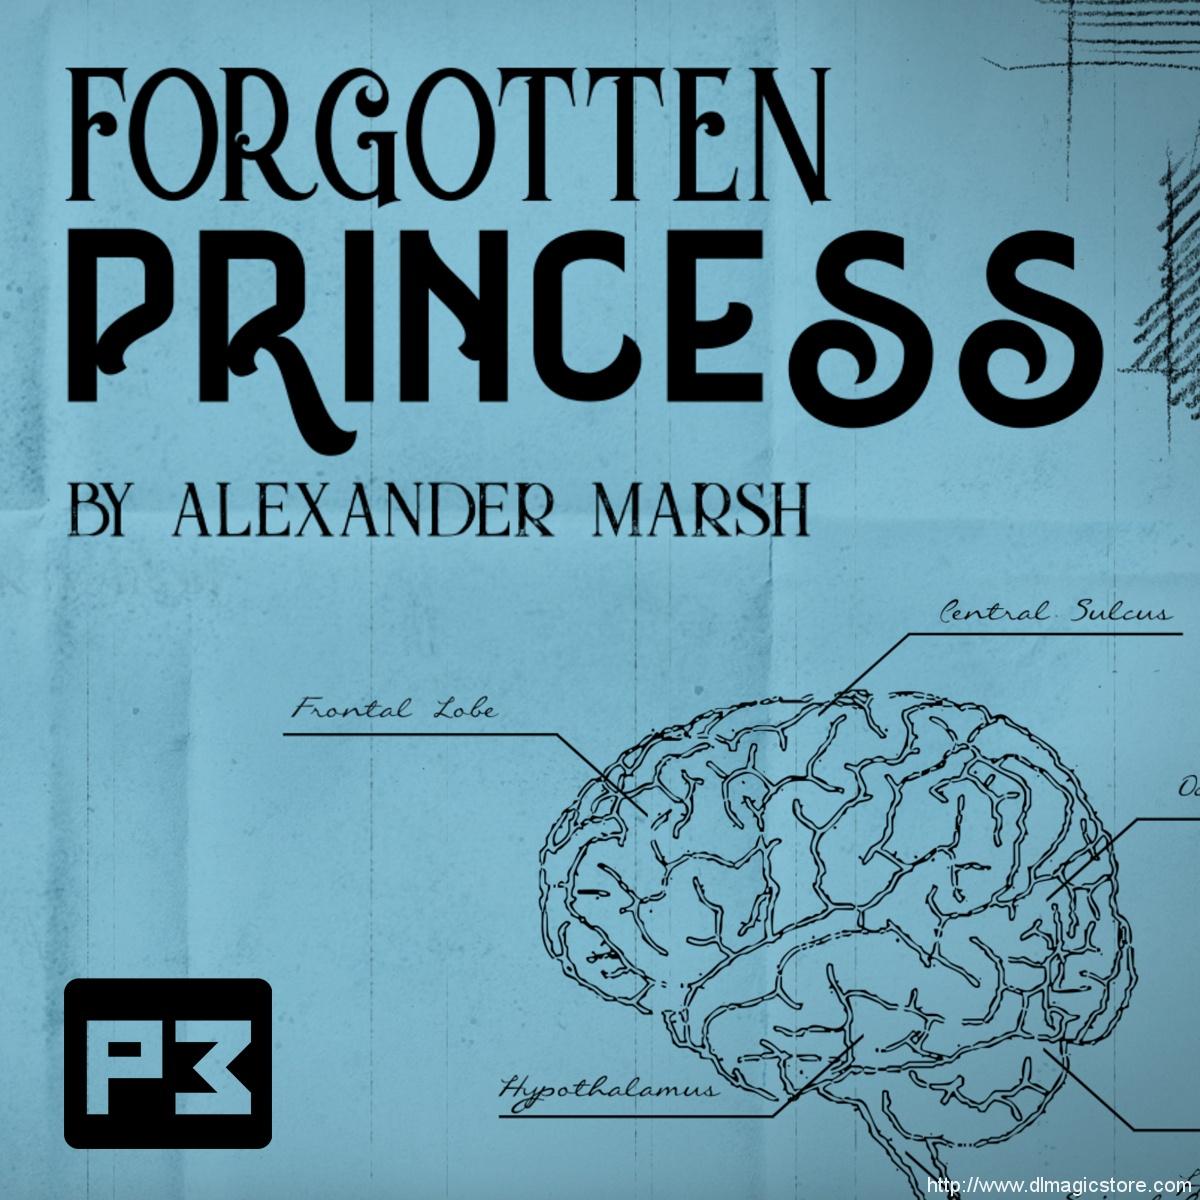 Forgotten Princess by Alexander Marsh